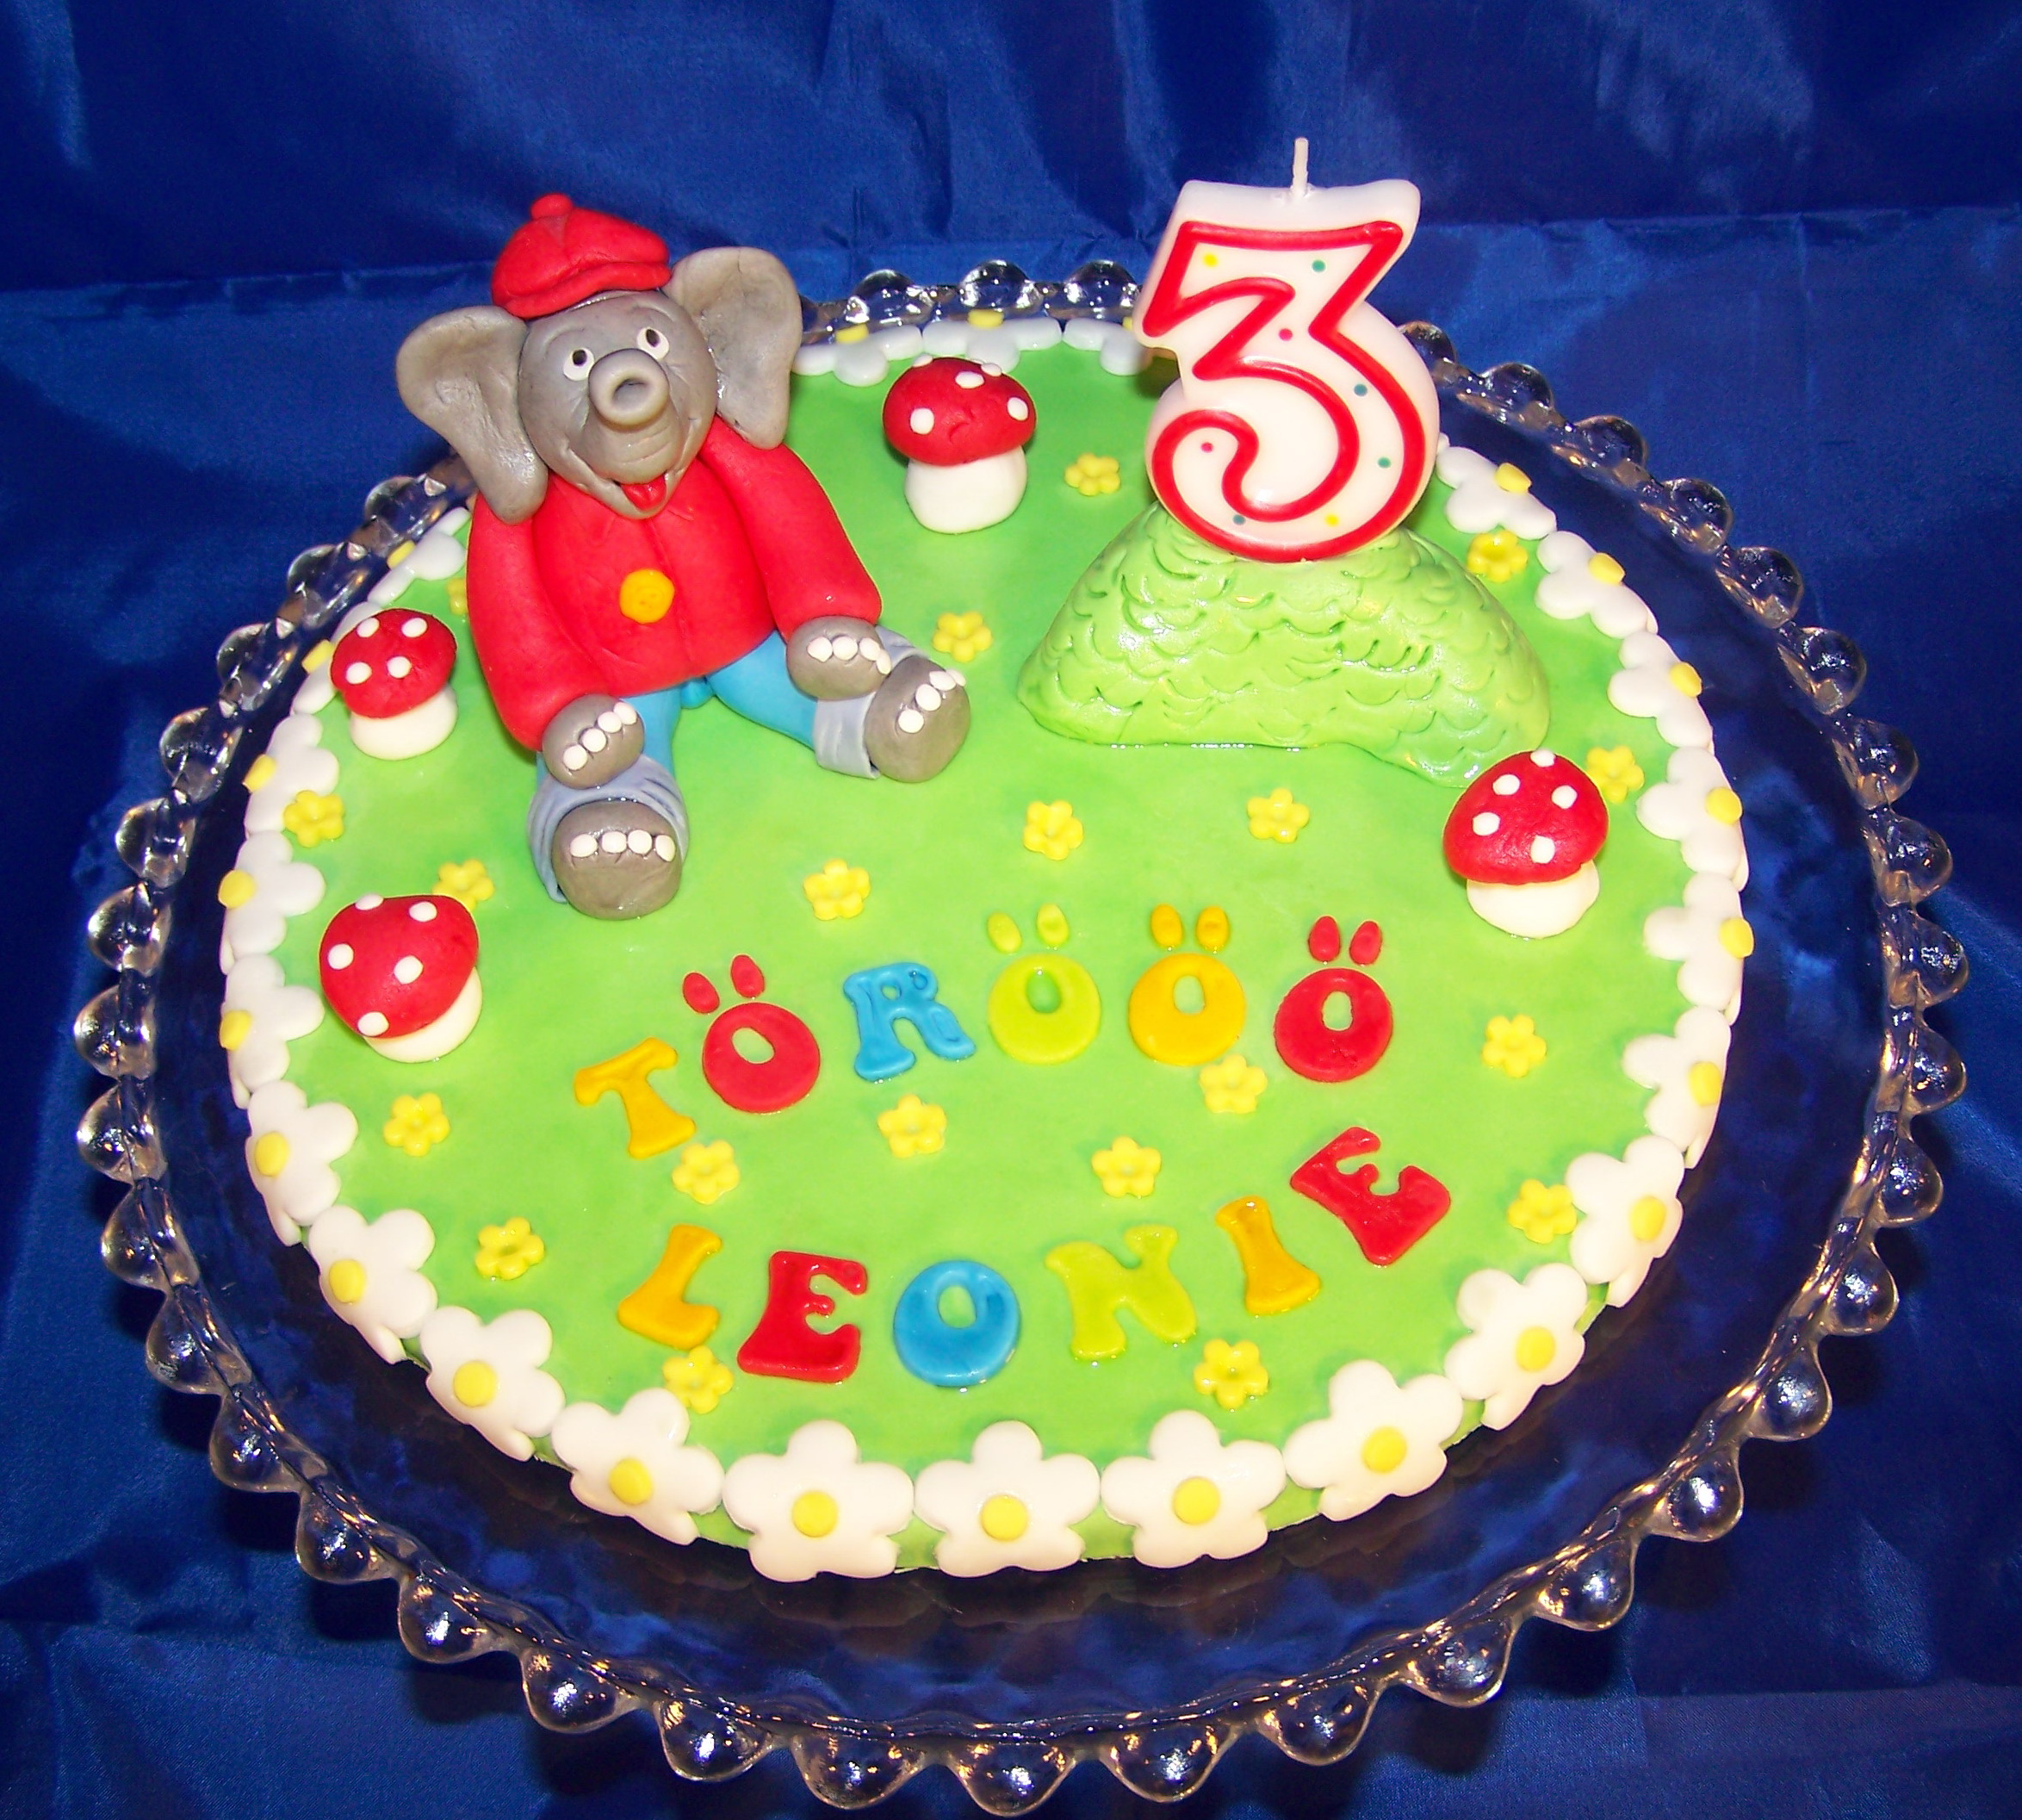 Benjamin Blmchen Cake Topper fr Leonie  CAKES FOR FUN